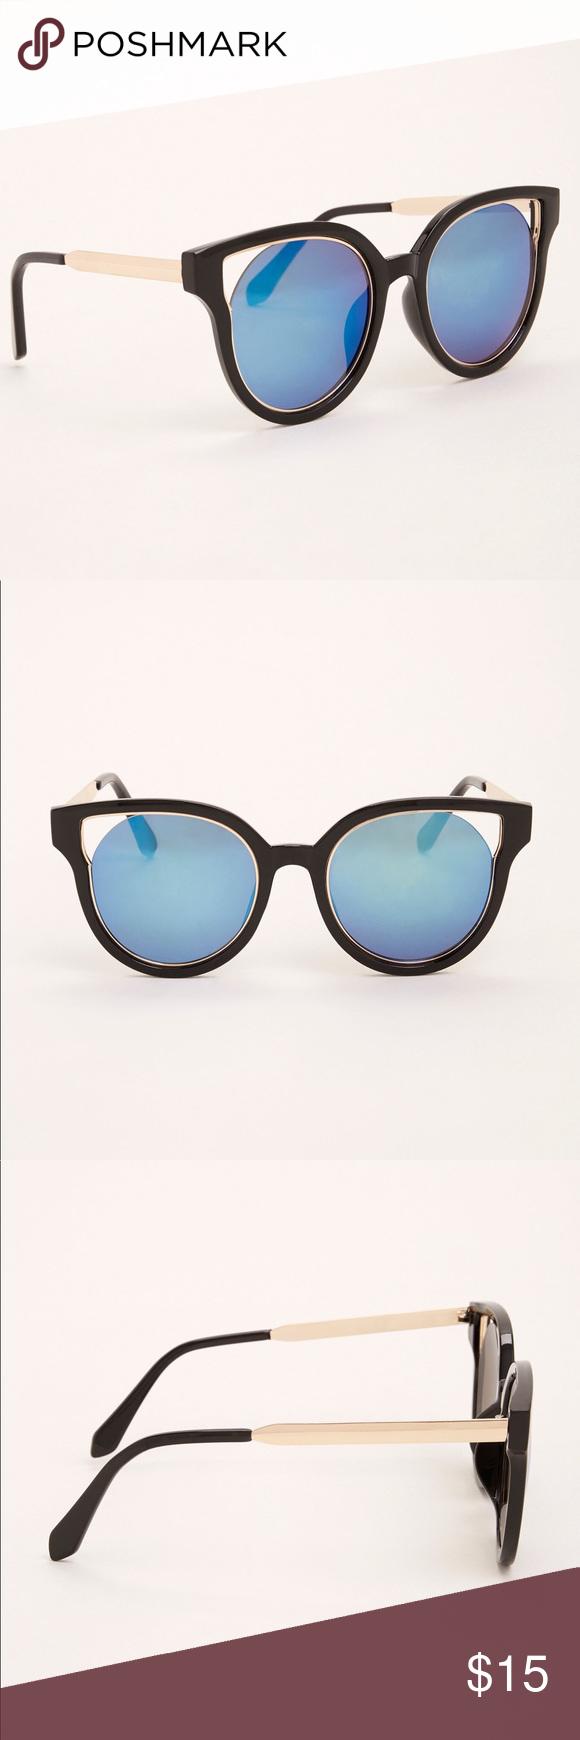 867cc6f40a6e9 🌷 Torrid cut out cateye reflective sunglasses NWT